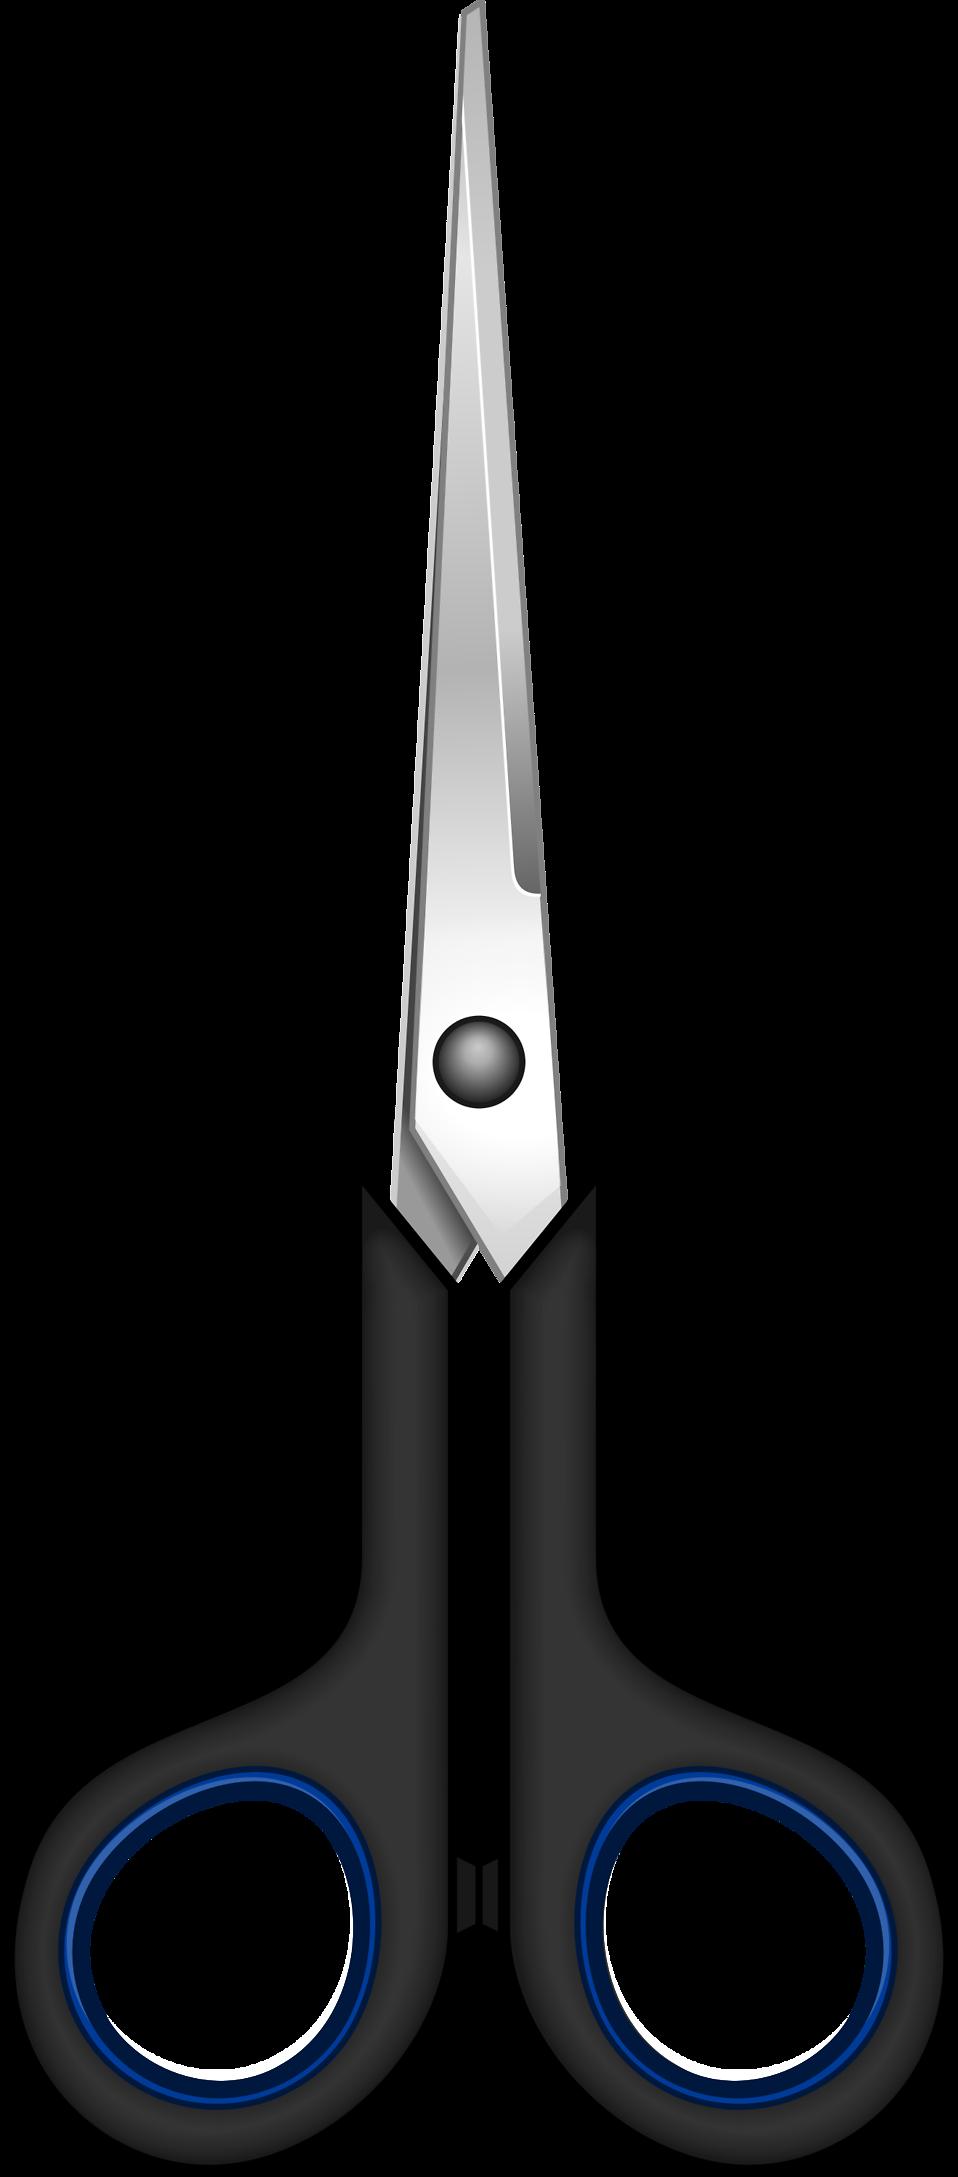 Clipart scissors household object. Free stock photo illustration